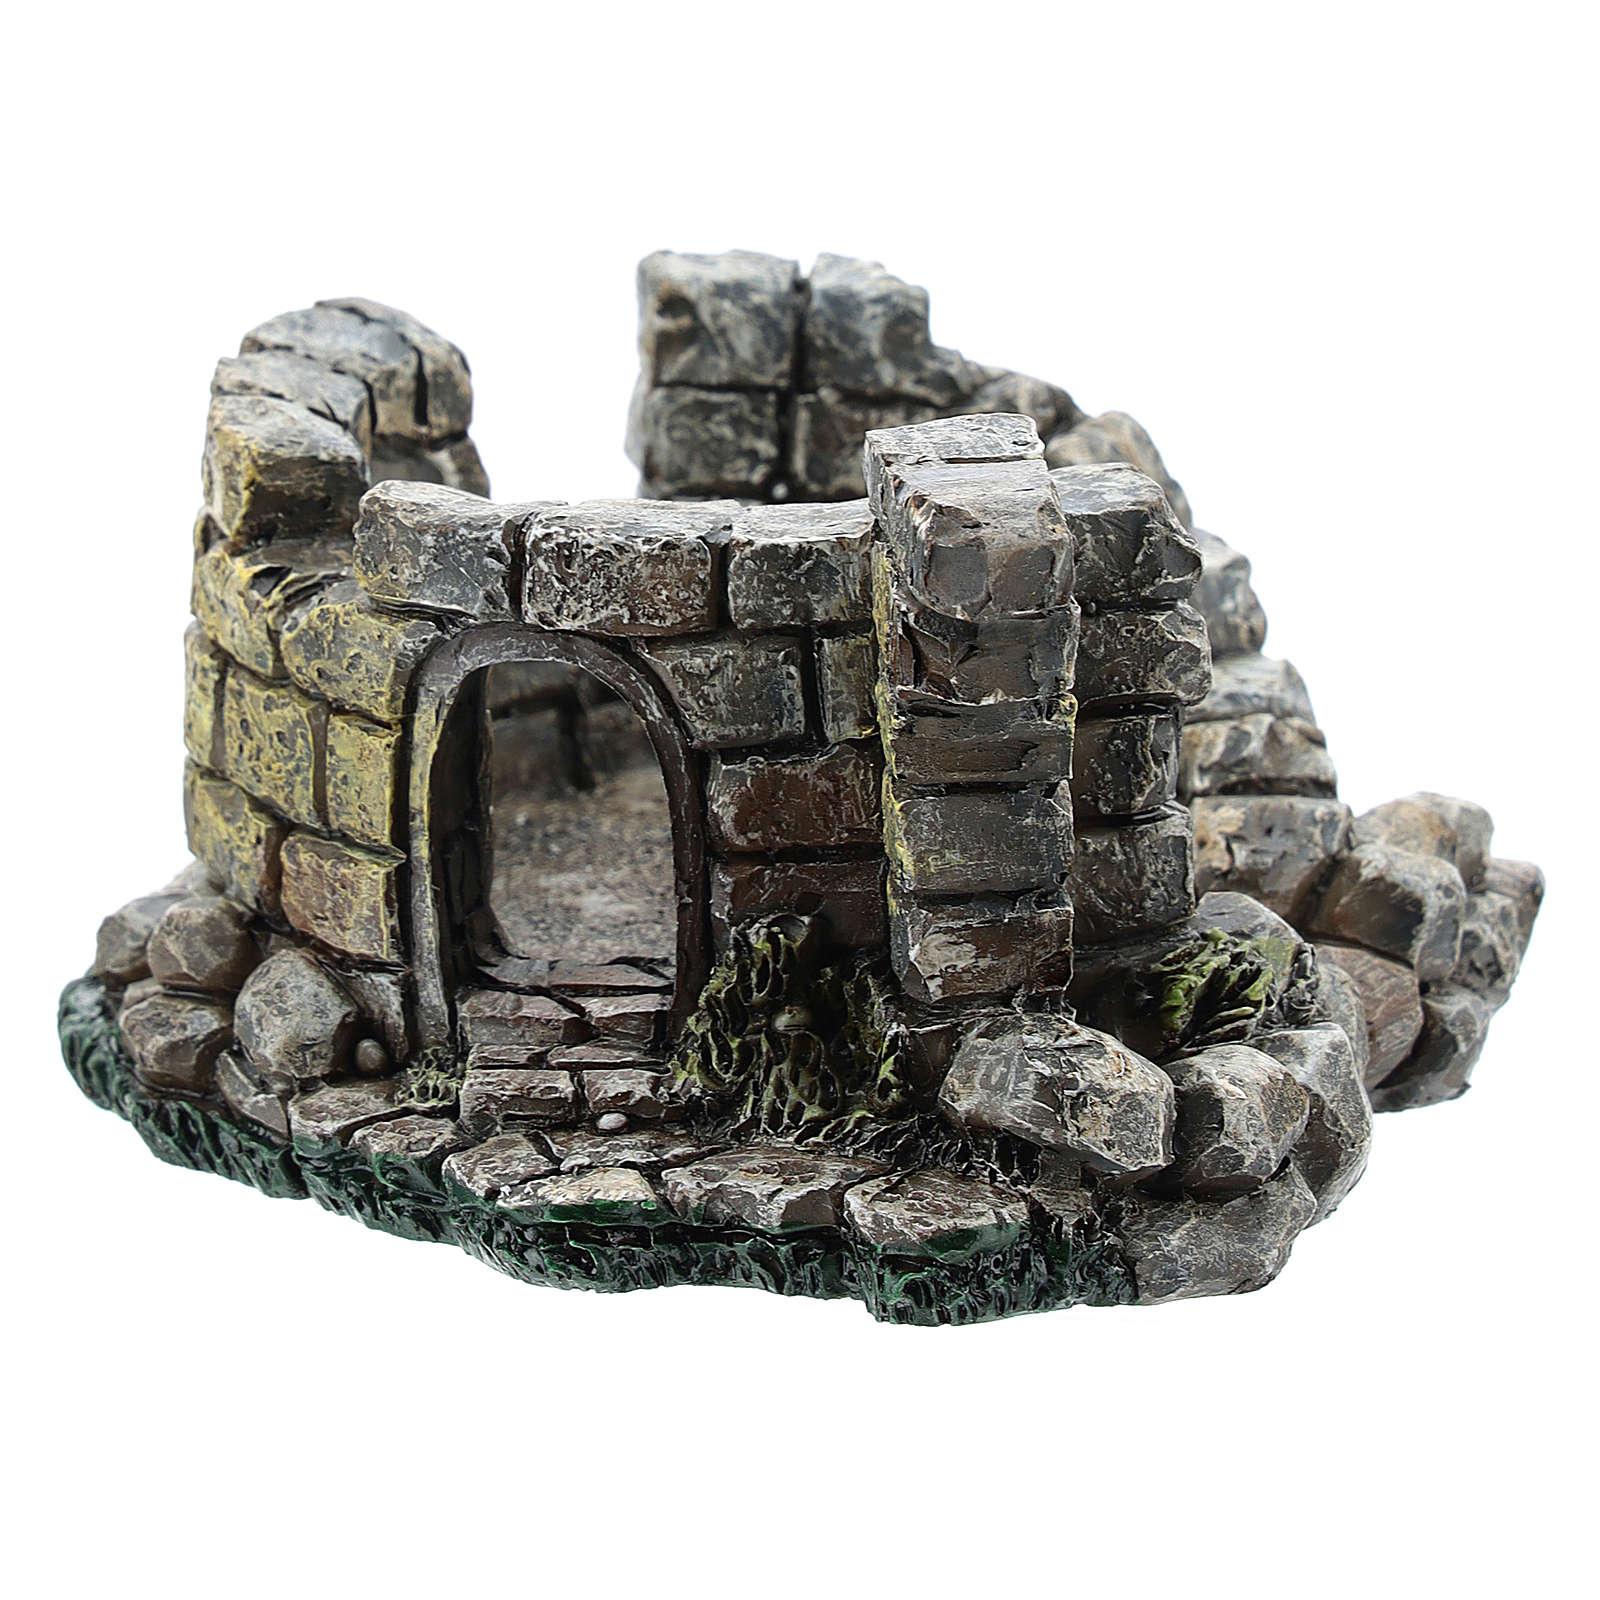 Nativity scene setting, castle ruins Moranduzzo in resin for 4-6 cm statues 4